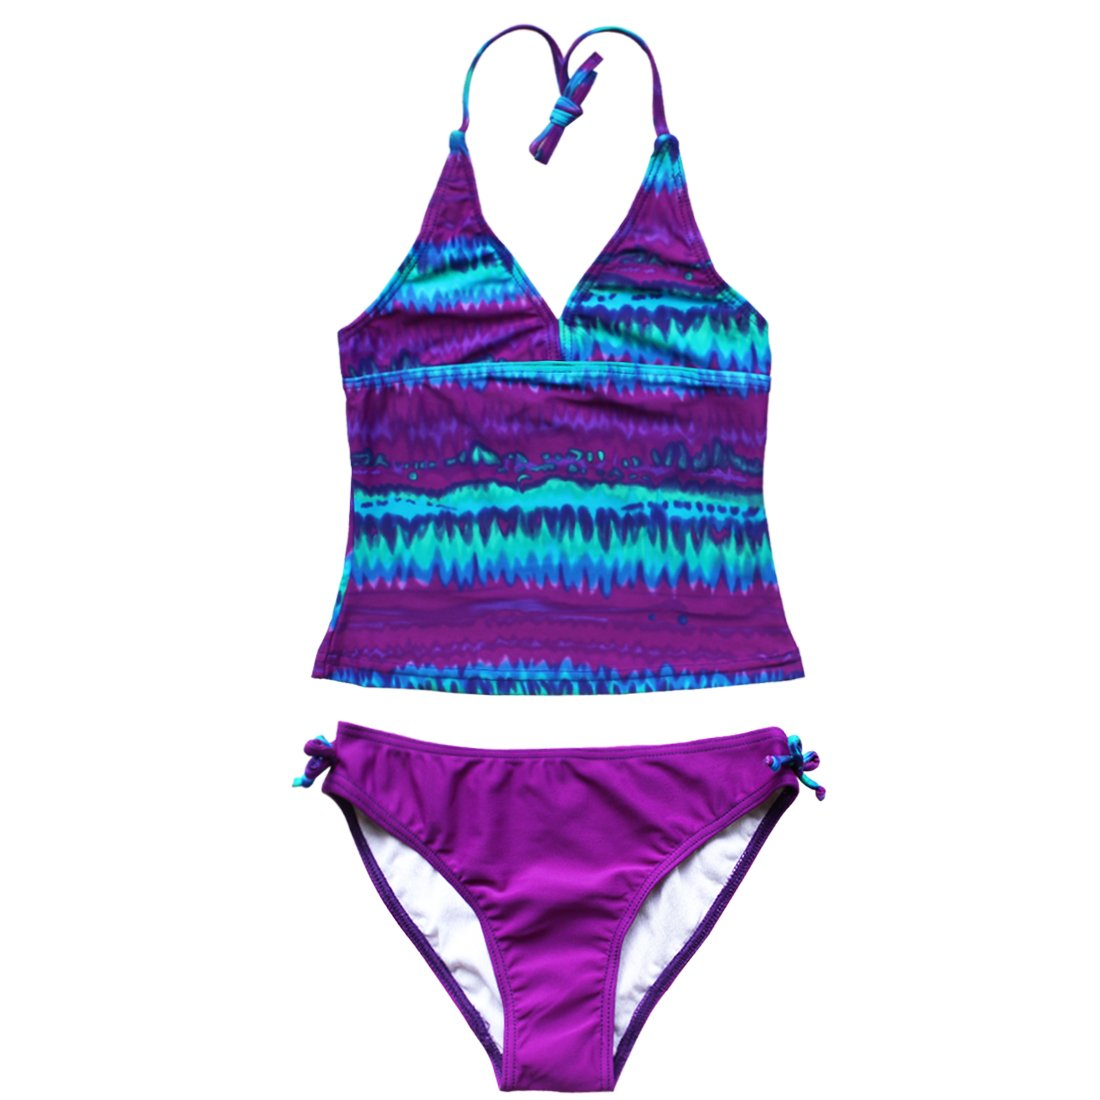 iiniim Youth Big Girls Two Piece Halter Tankini Swimsuit Bathing Suit Top with Boyshort Swimwear Set